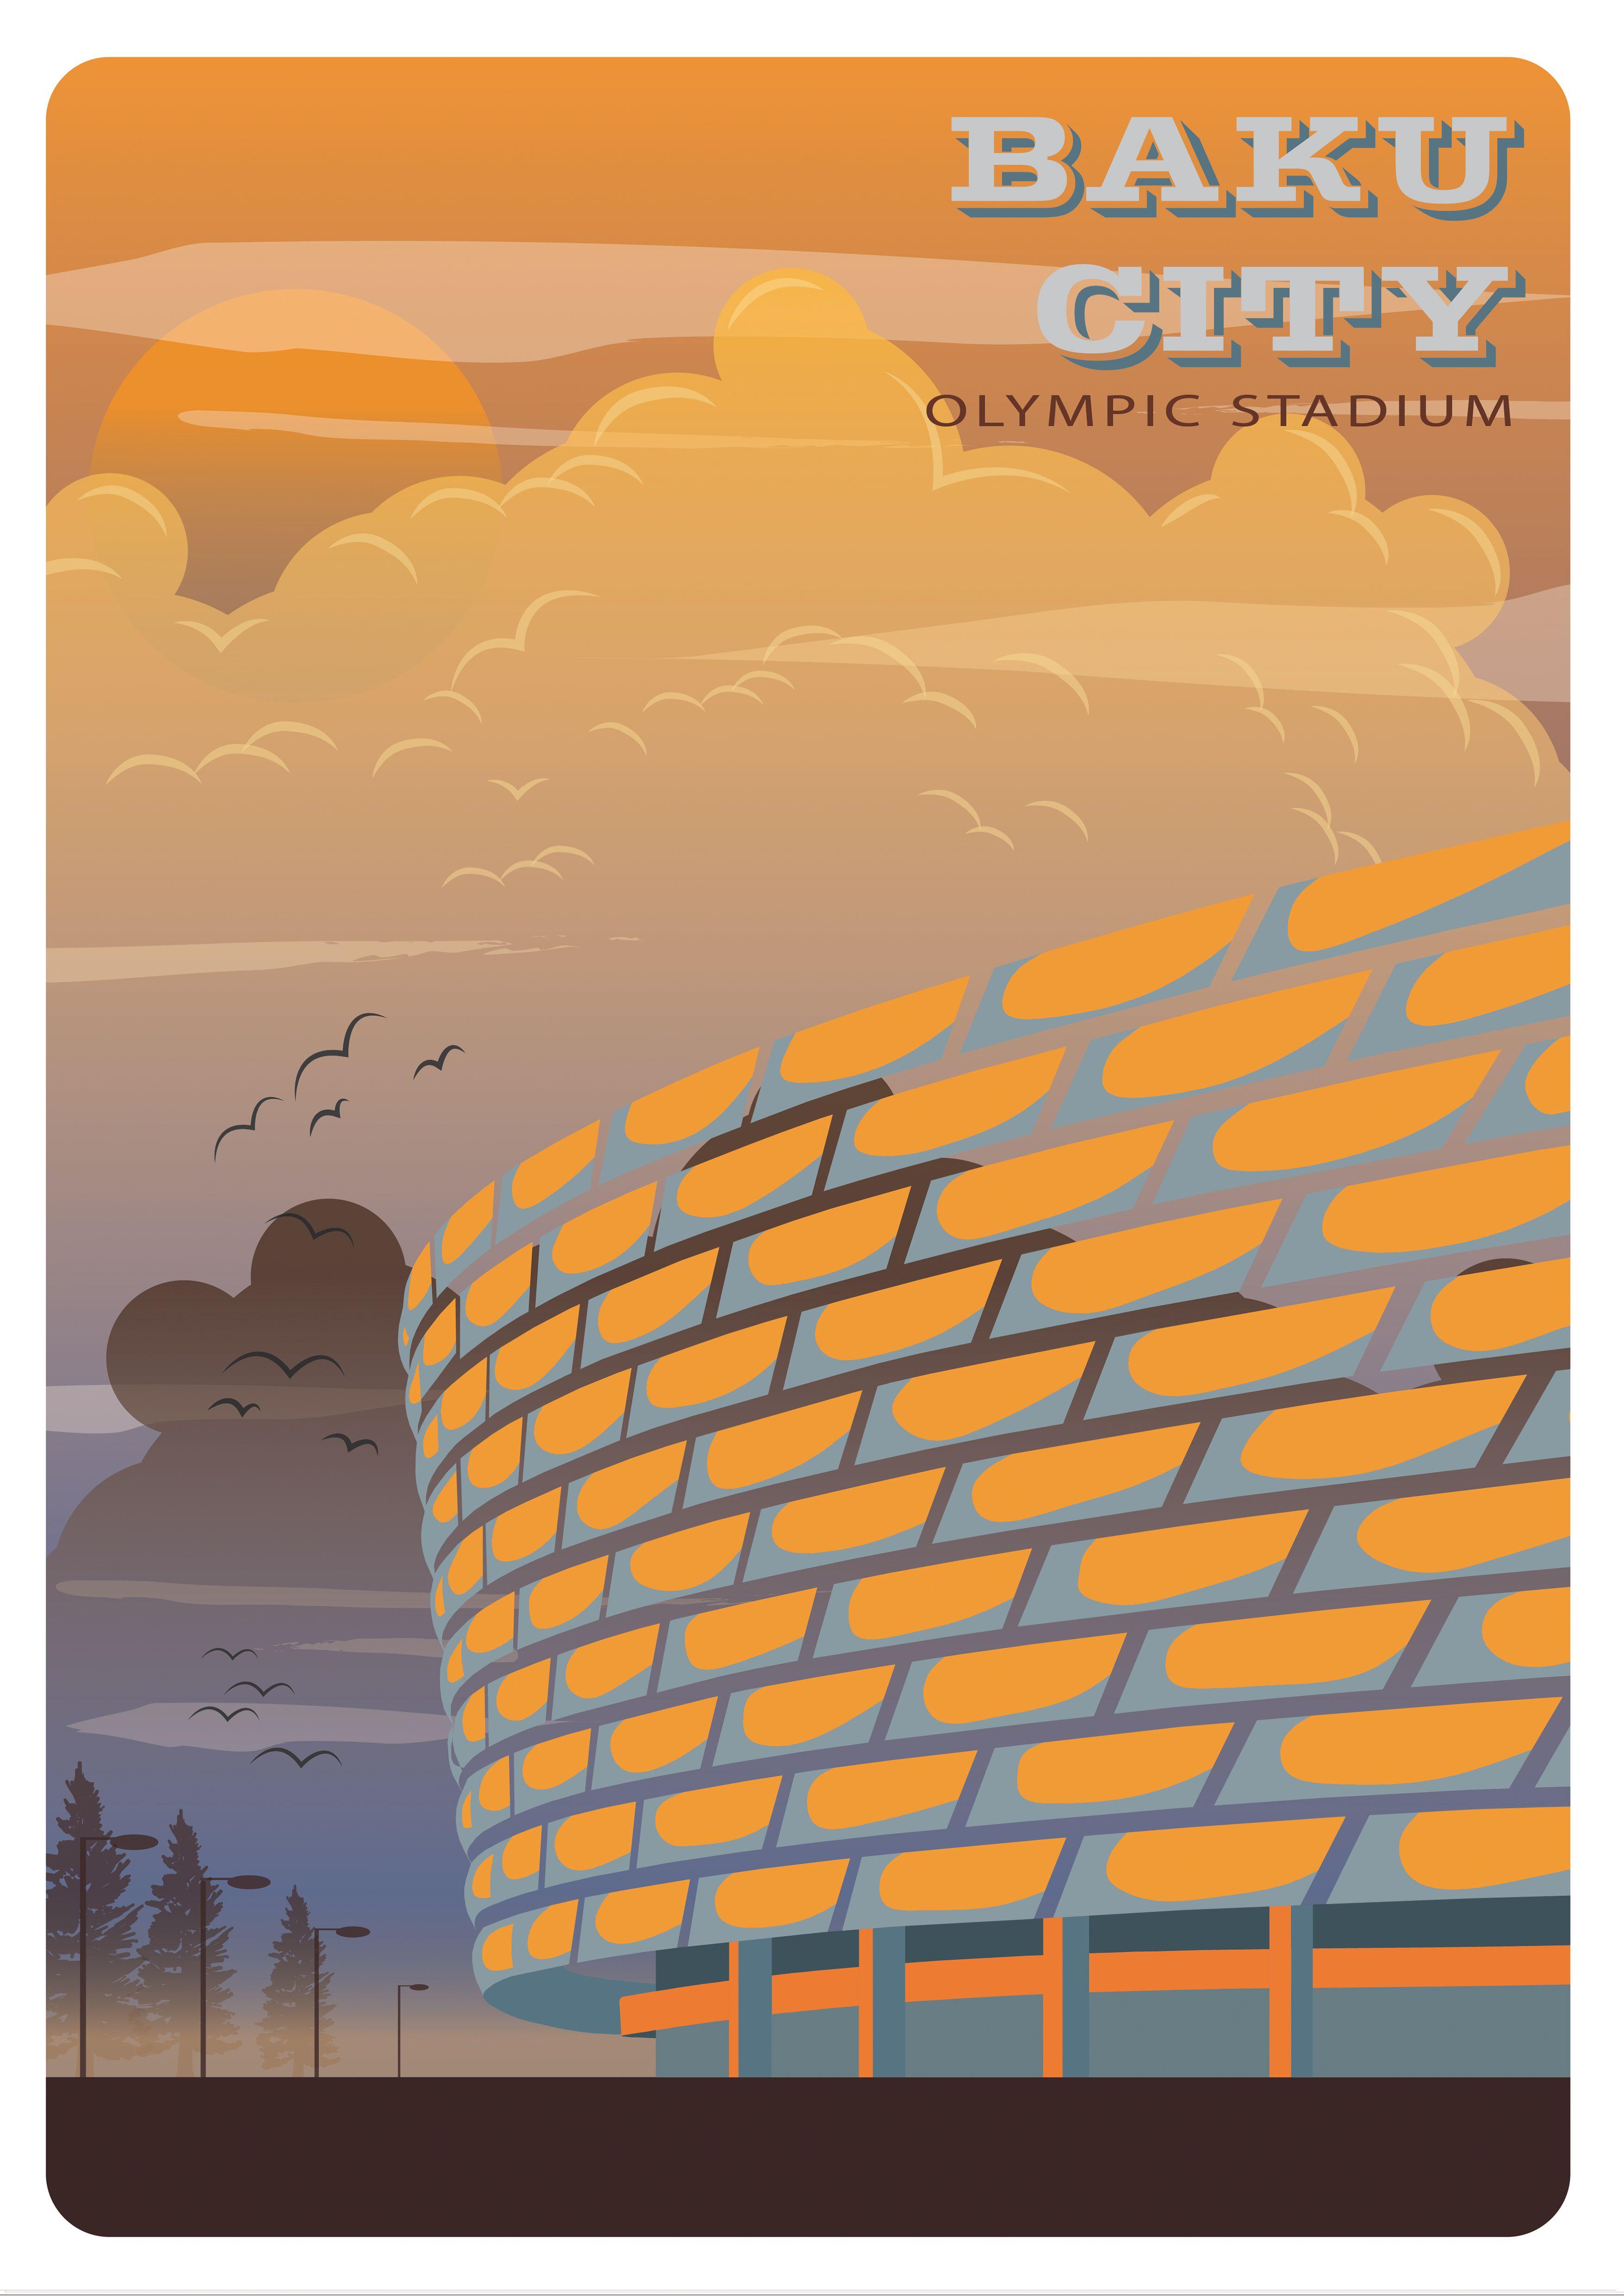 Baku City Retro Poster Olympic Stadium Retro Poster Baku City Retro Art Deco